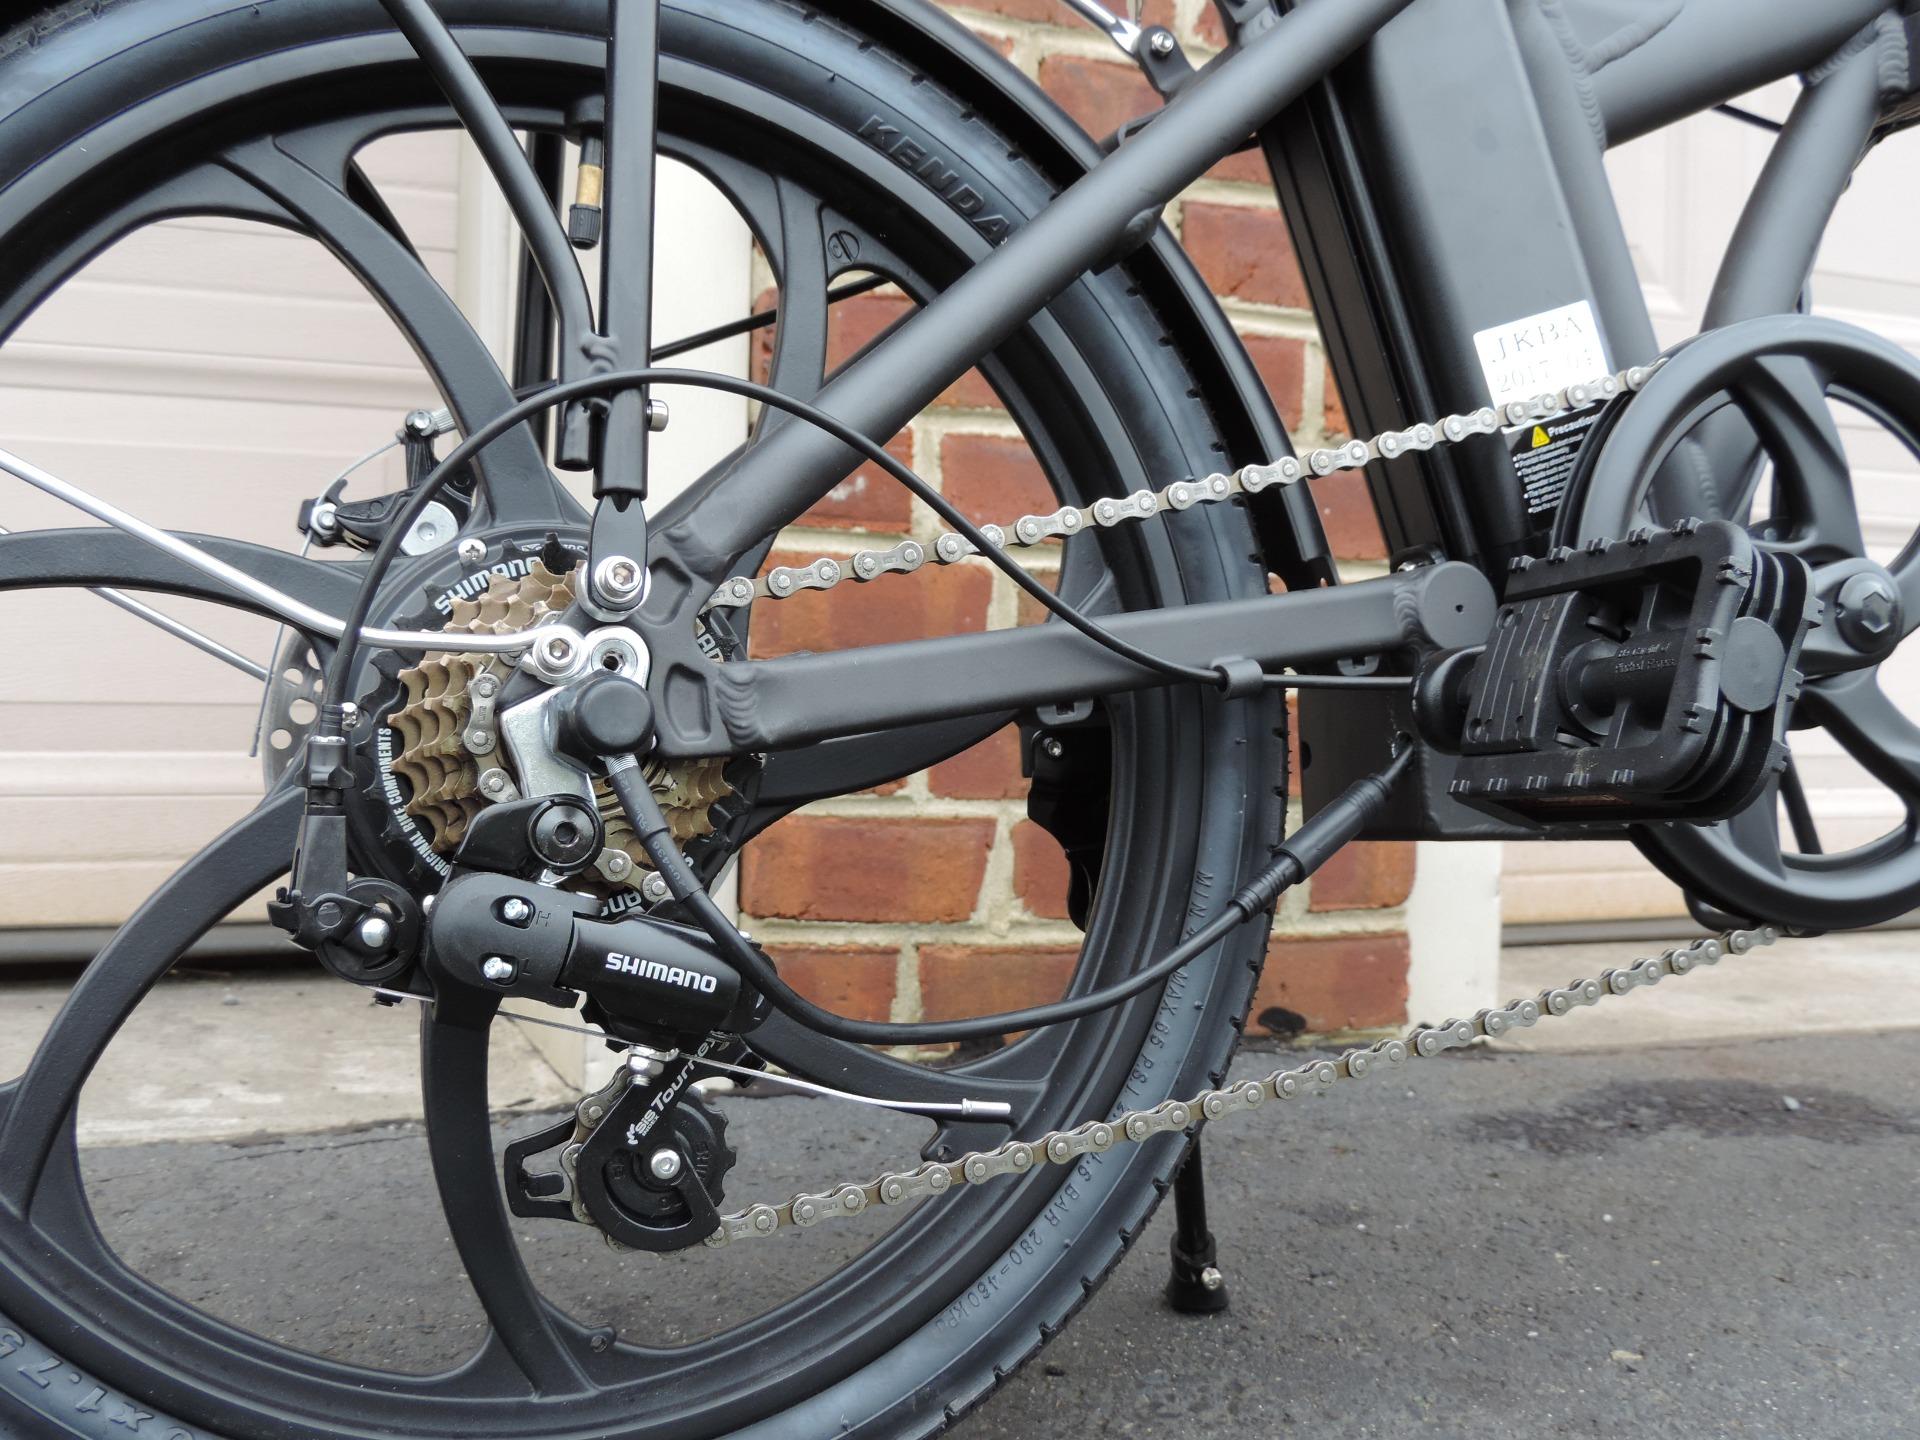 New-2018-Bintelli-F1-Electric-Folding-Bike